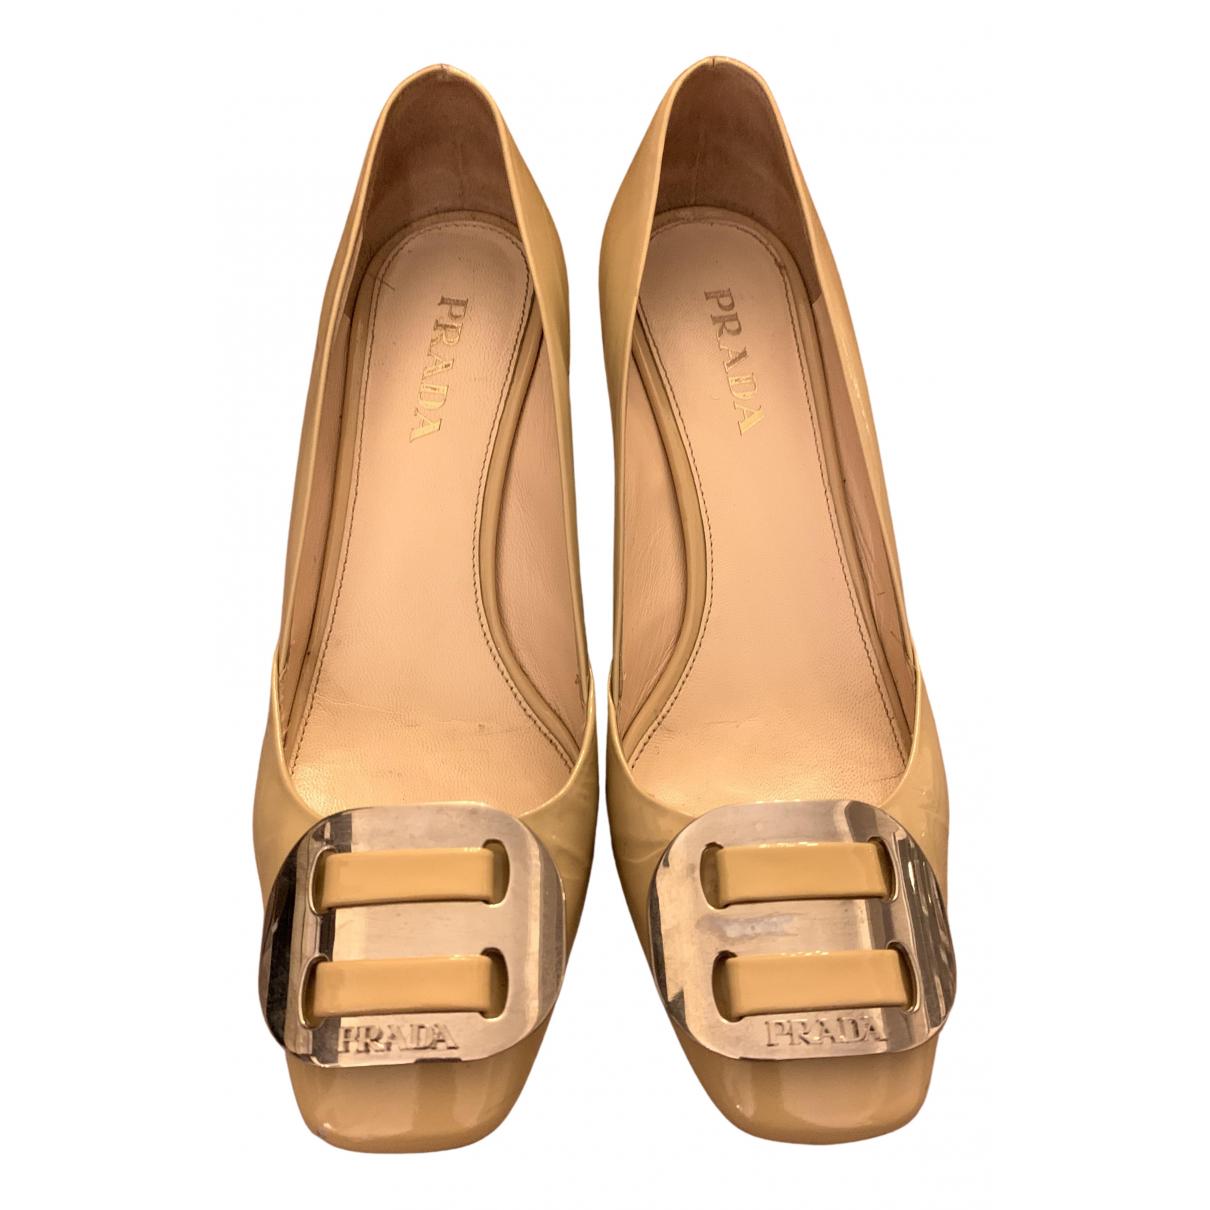 Prada N Beige Patent leather Heels for Women 36 EU